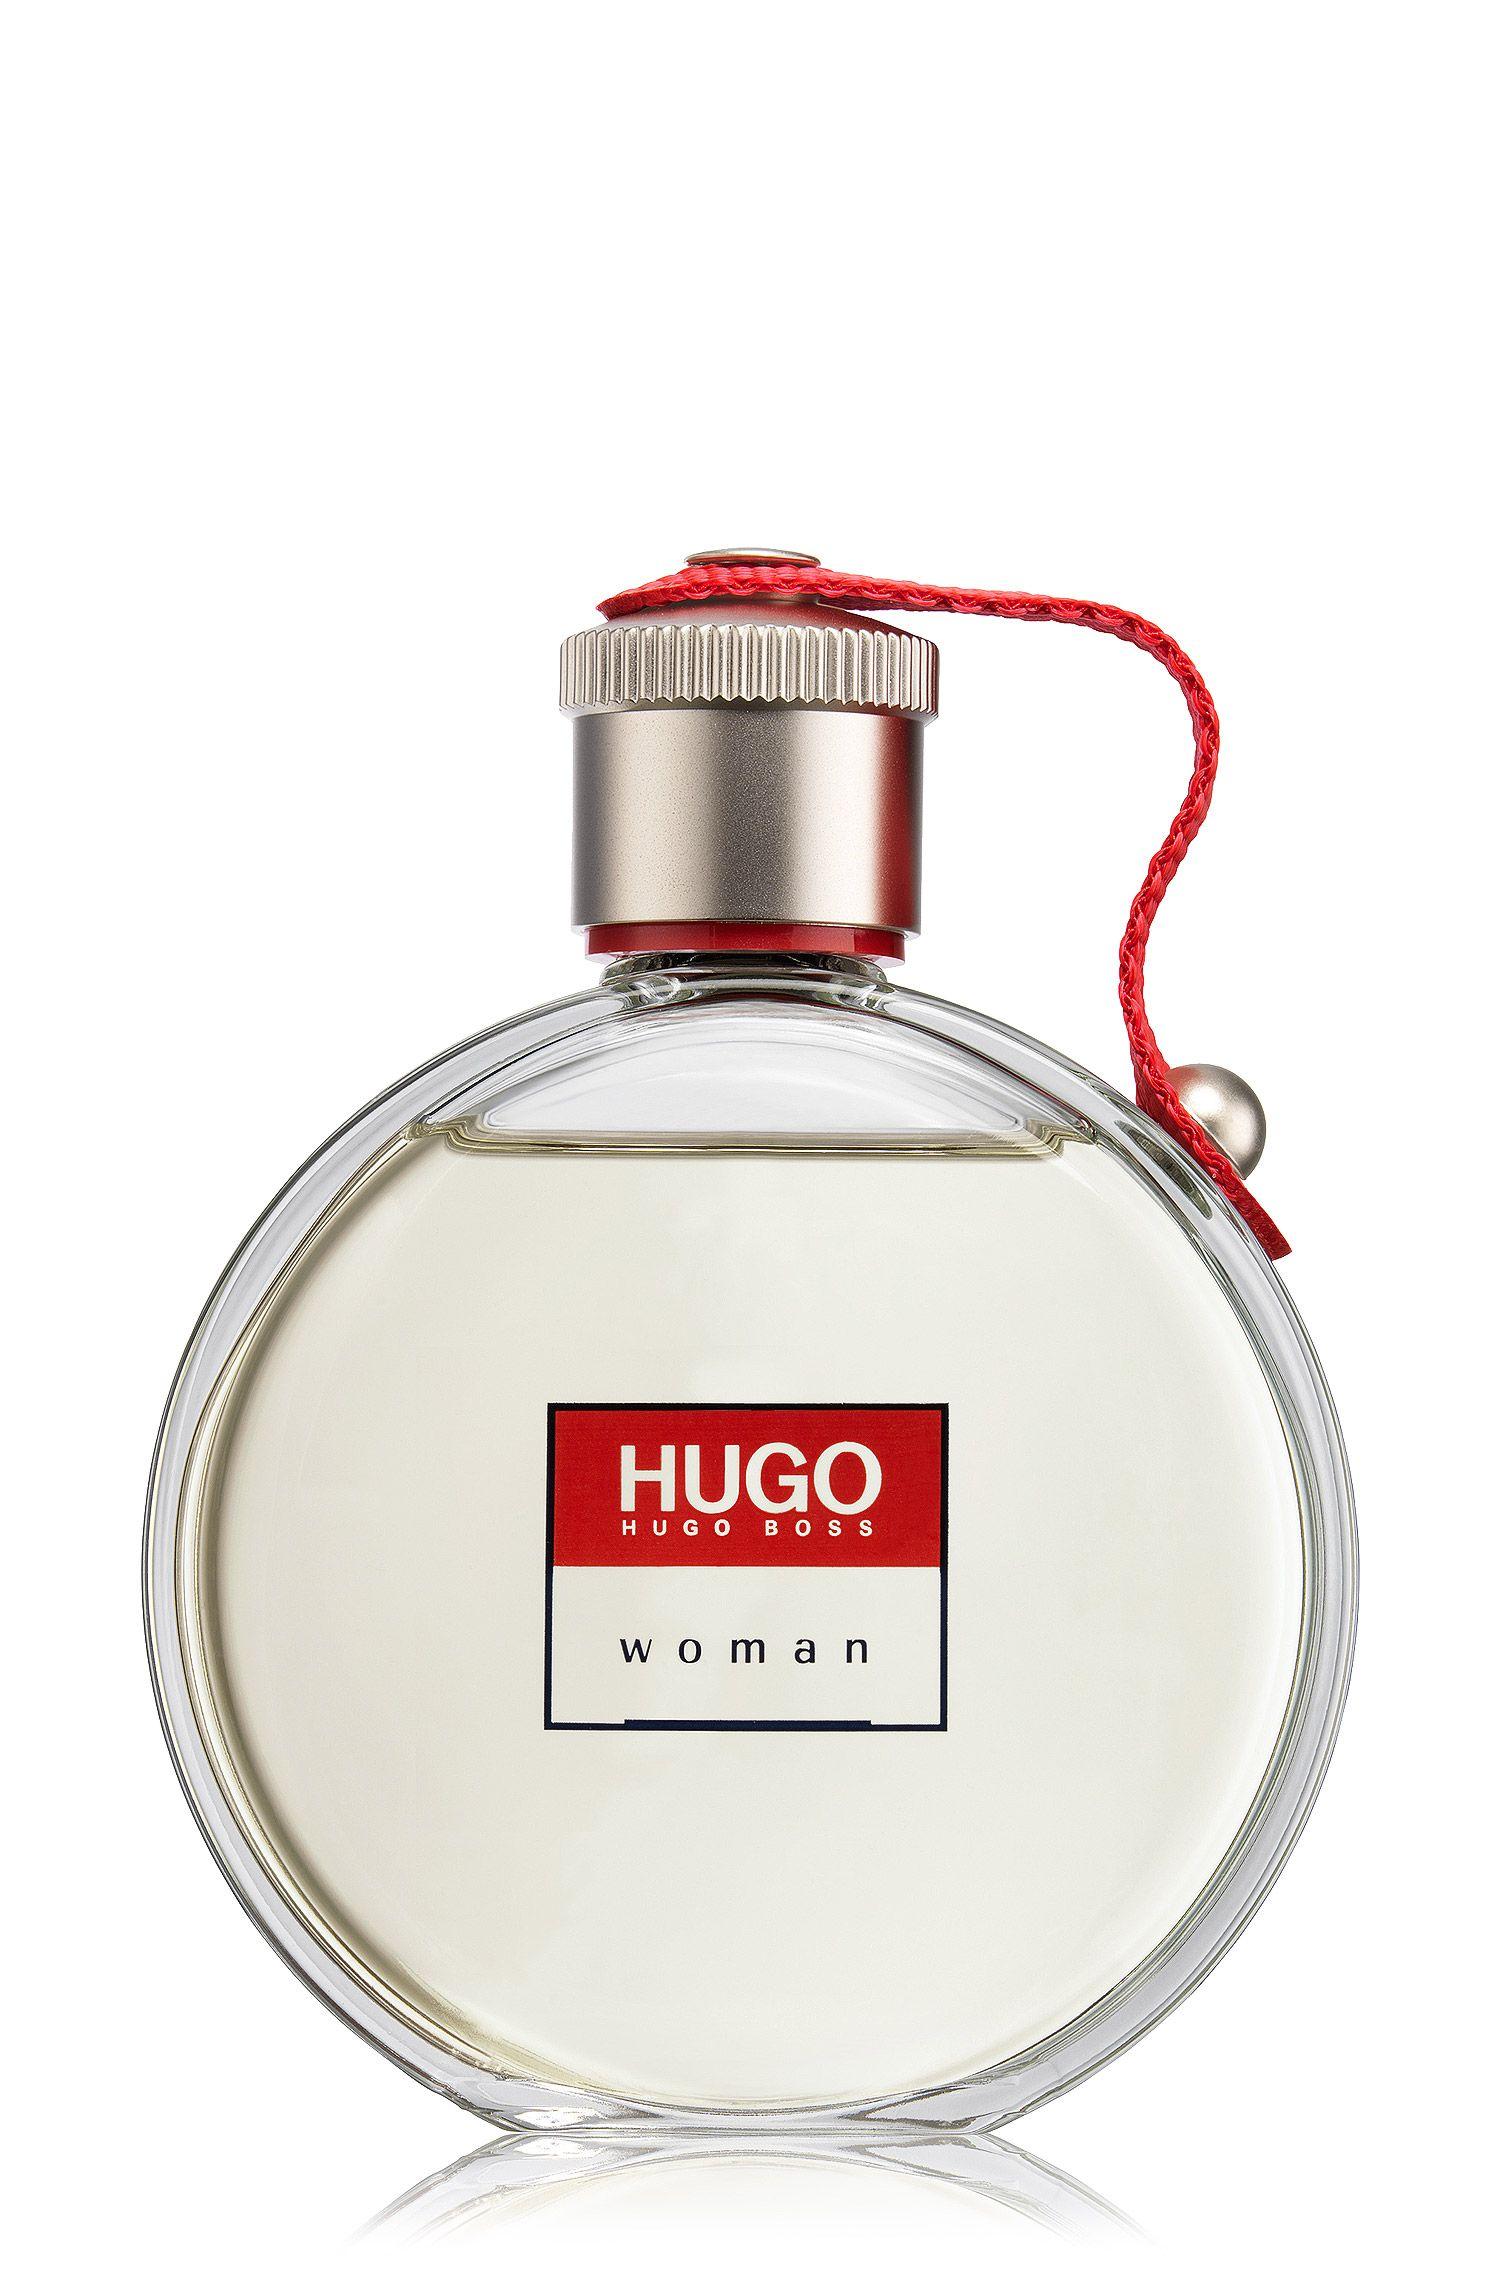 HUGO Woman eau de toilette 125 ml